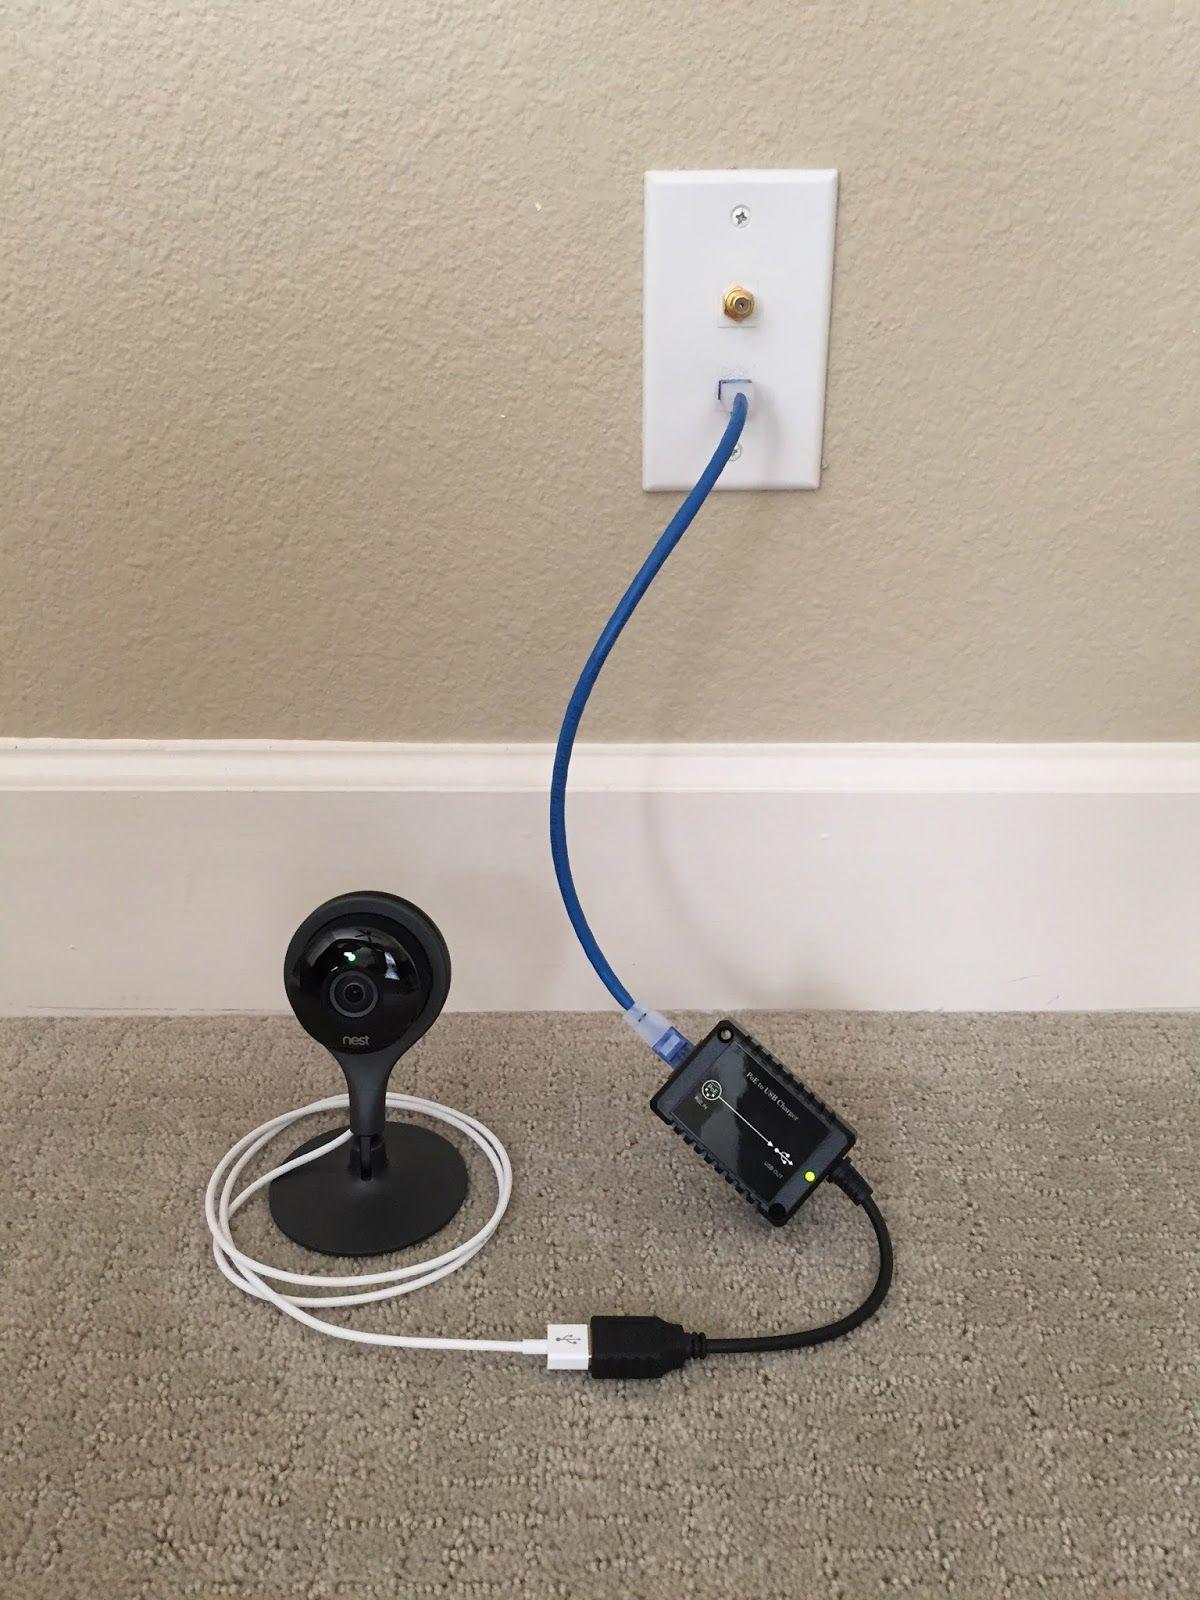 La Nest Cam indoor est une caméra filaire